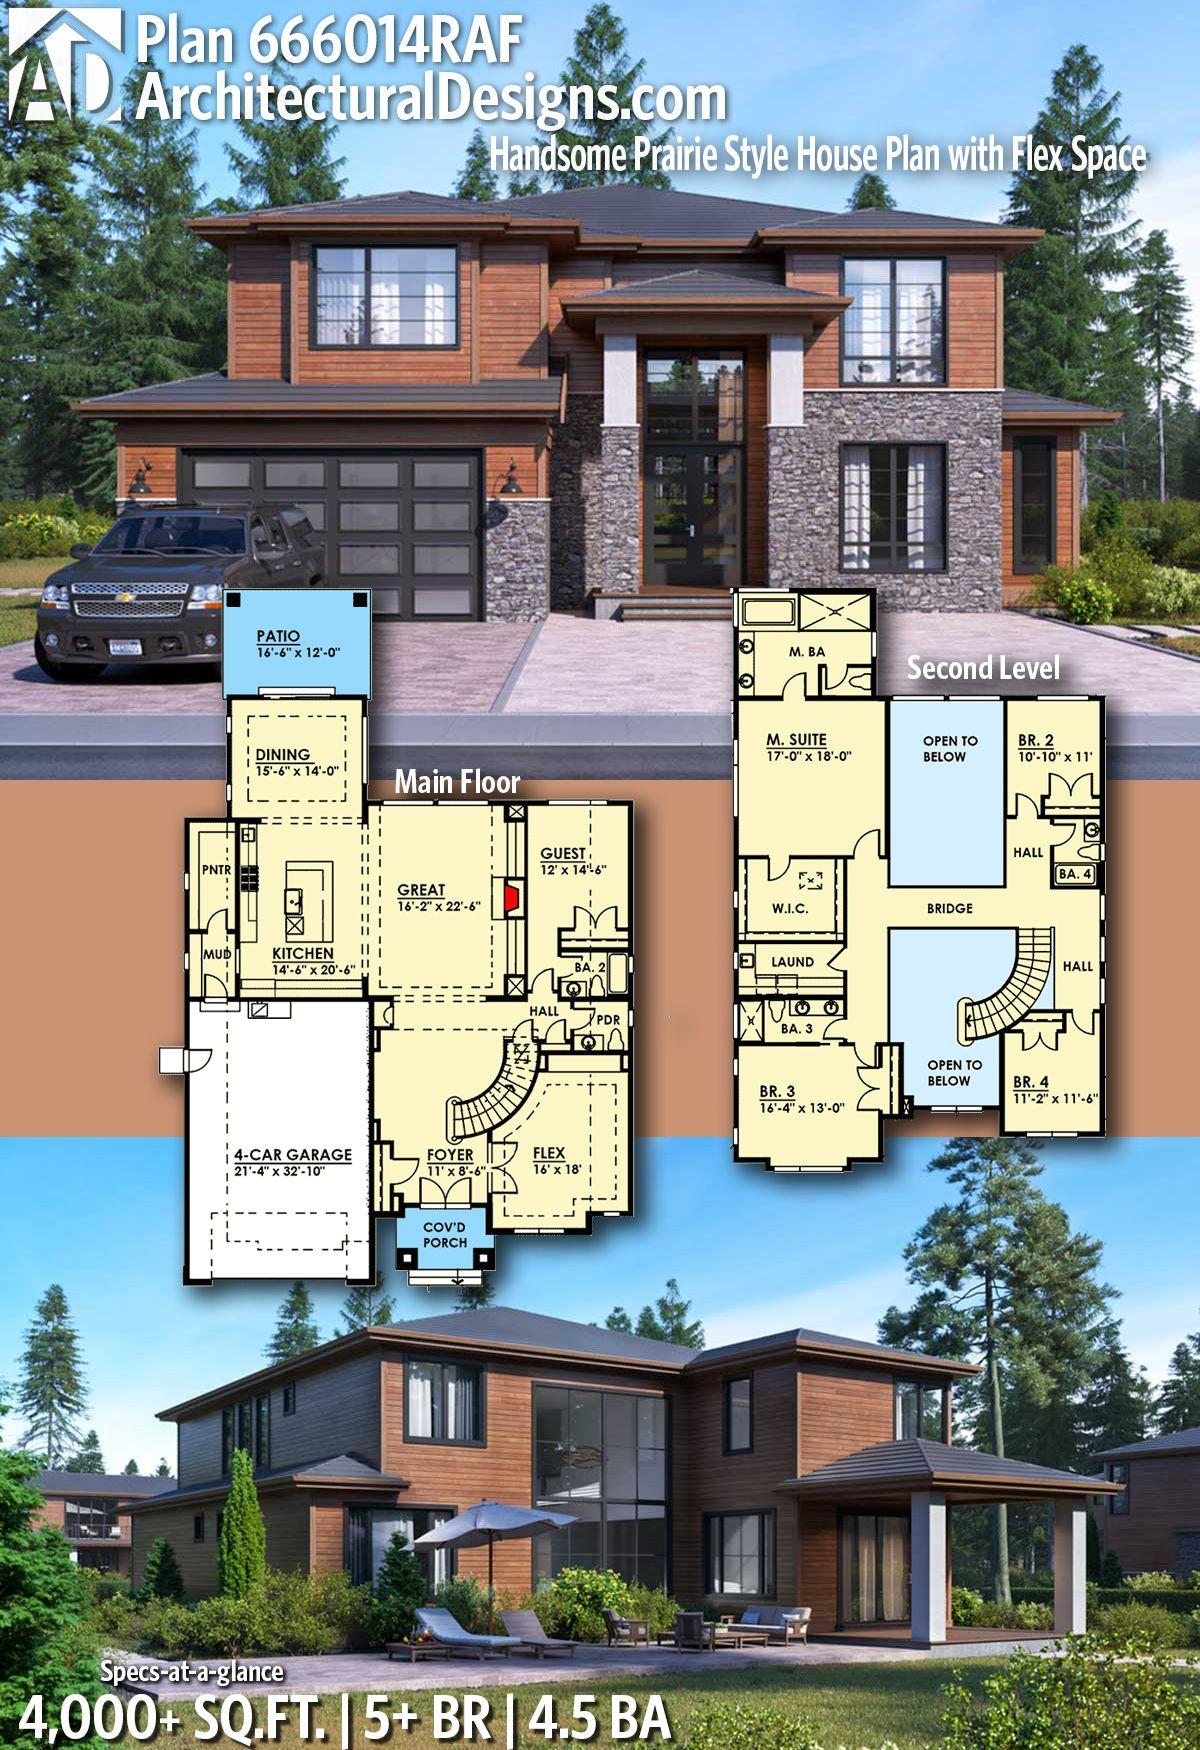 Architectural designs modern house plan raf beds baths sq also mejores imagenes de casas en rh pinterest